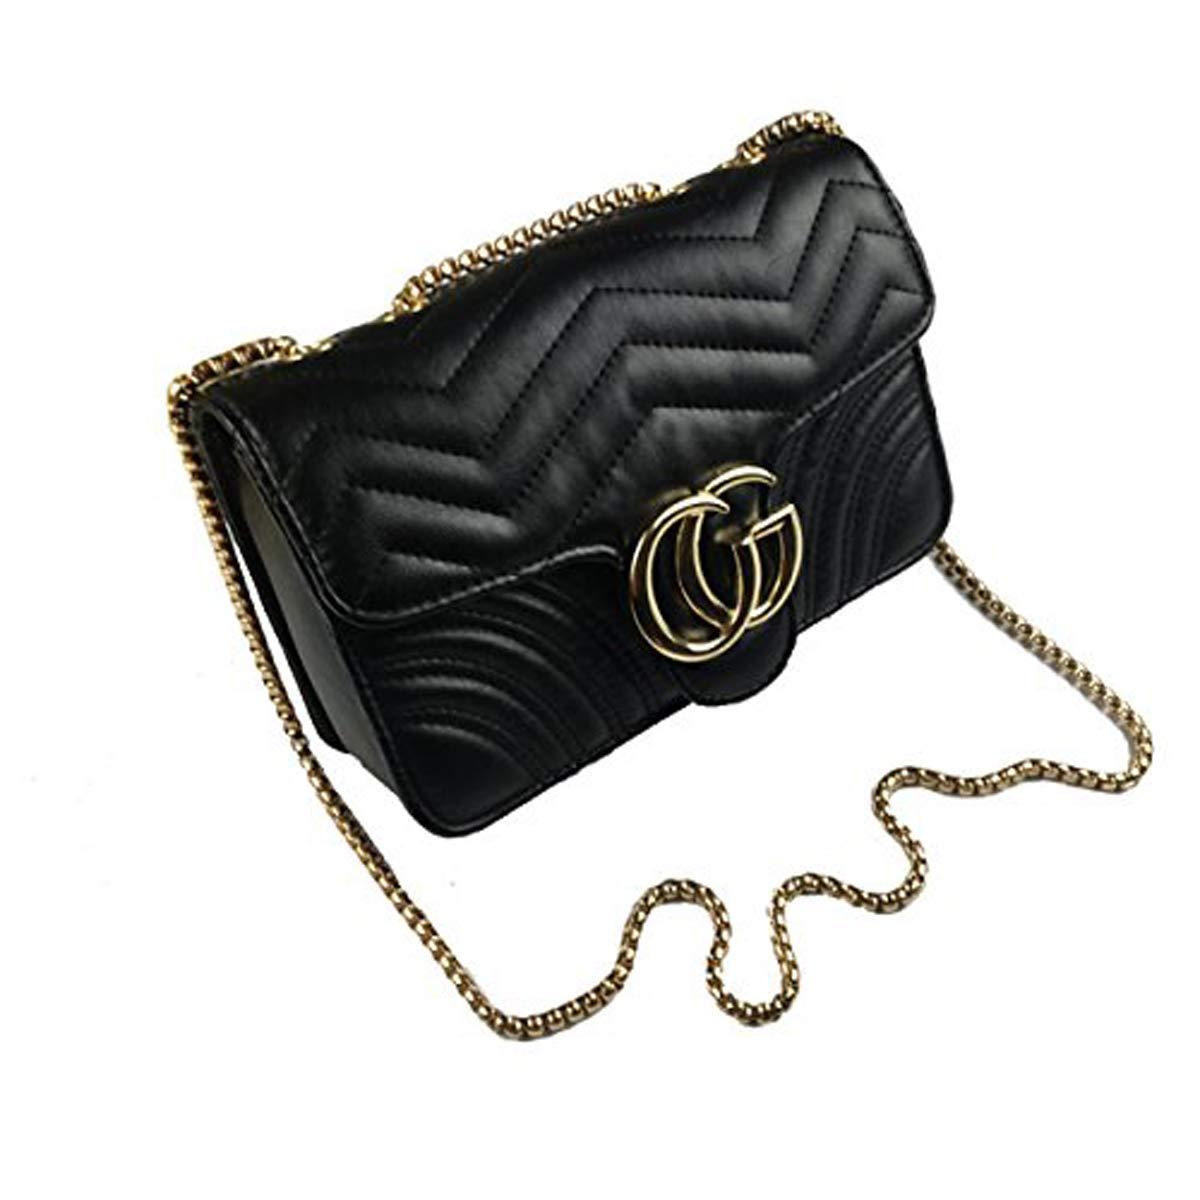 SHRJJ 2018 Girls Fashion CG Lock Velvet/High Quality Leather Shoulder Bag Crossbody Bag Wave Pattern Vintage e Small Bag Large Space Baby Diaper Bag for Woman Jujube Red Velvet, 24 * 8 * 16cm S.splTX